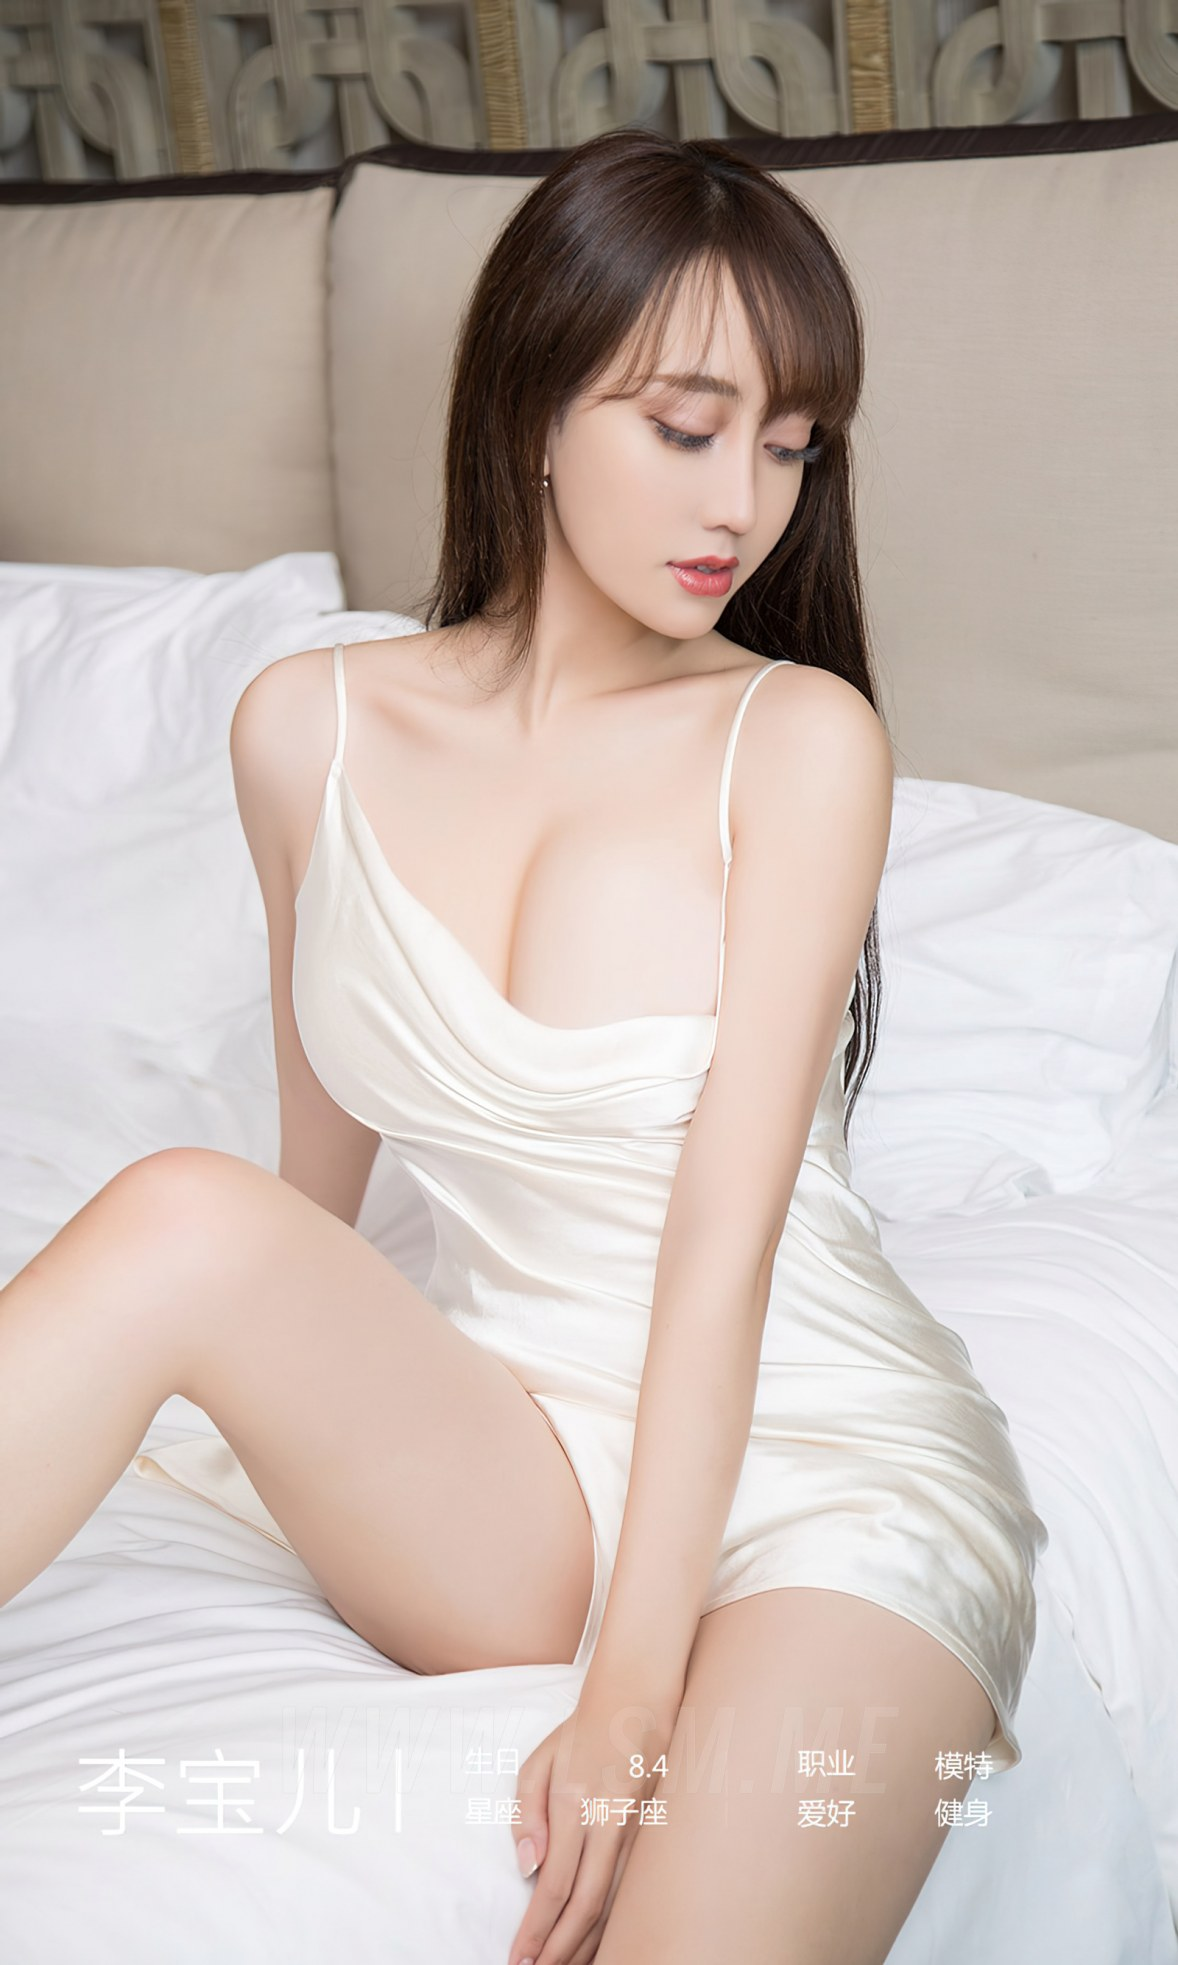 UGirls 爱尤物 No.2169  李宝儿 白色欲望 - 4